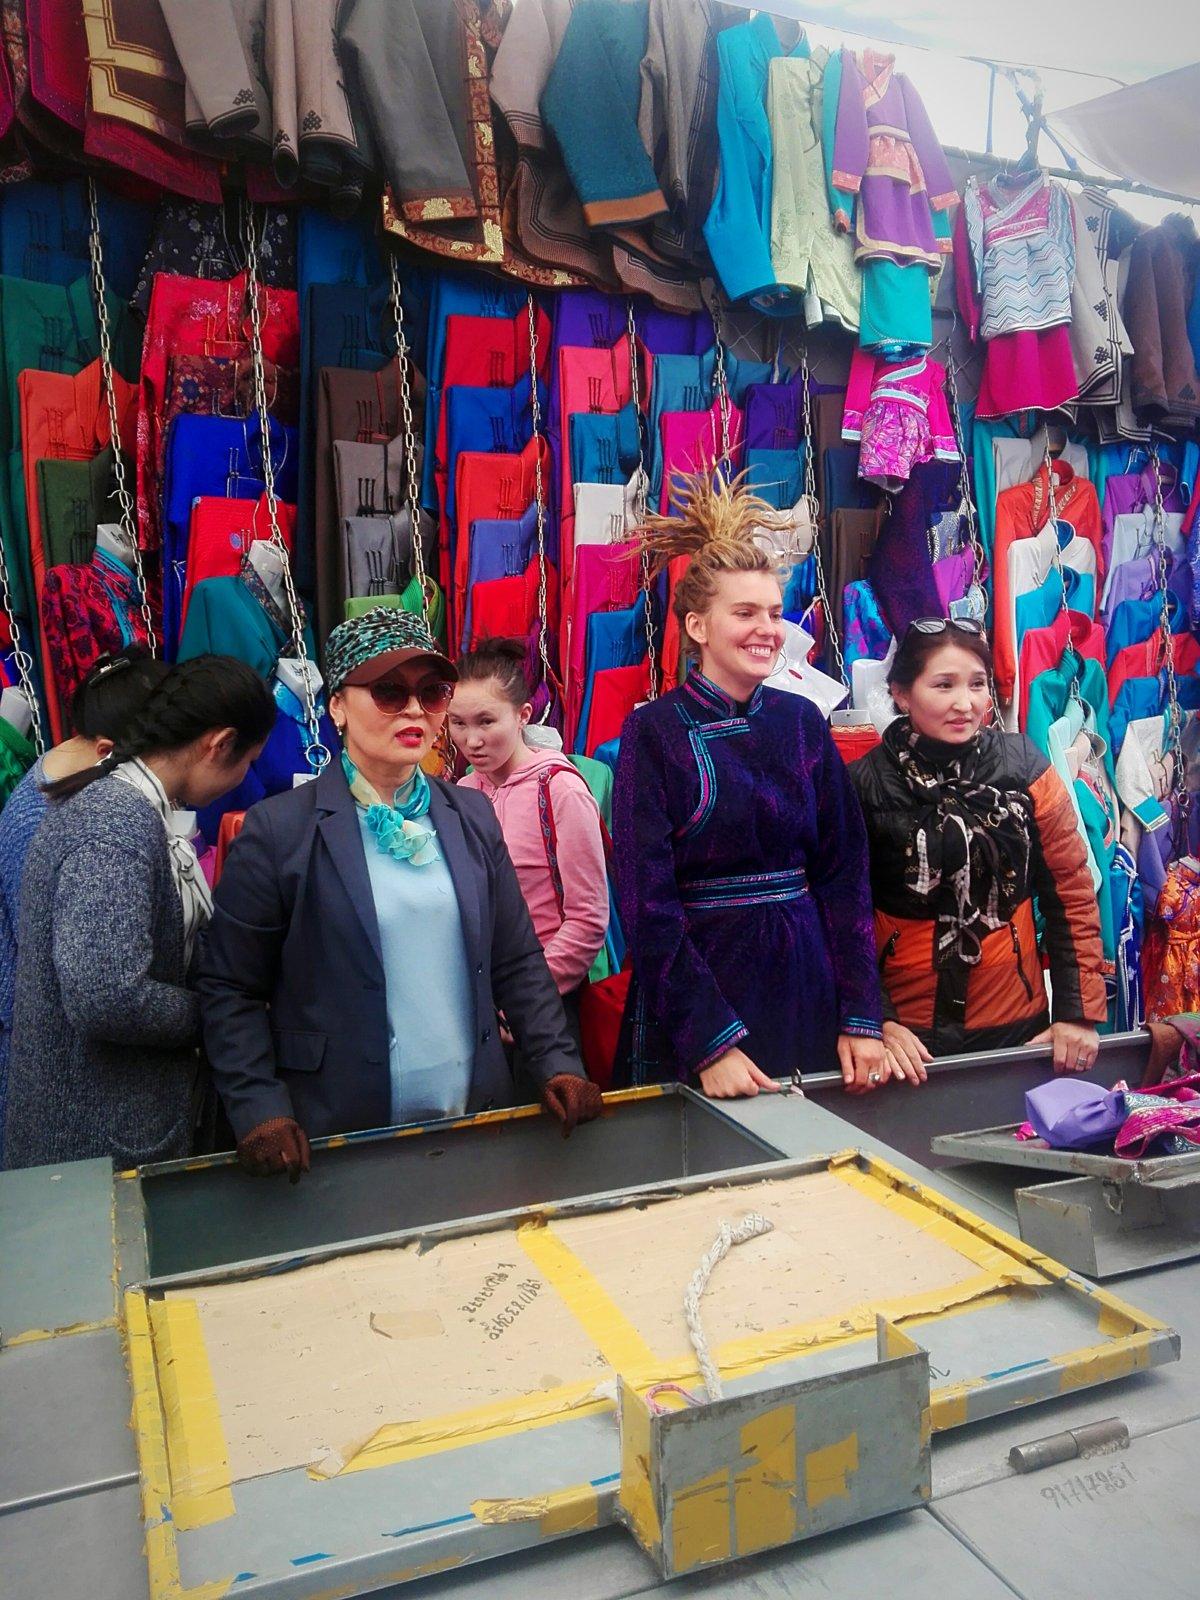 img_20160515_192629-jpg.30624_Mongolia Rainbow Horse Caravan_Travel Stories_Squat the Planet_3:30 AM